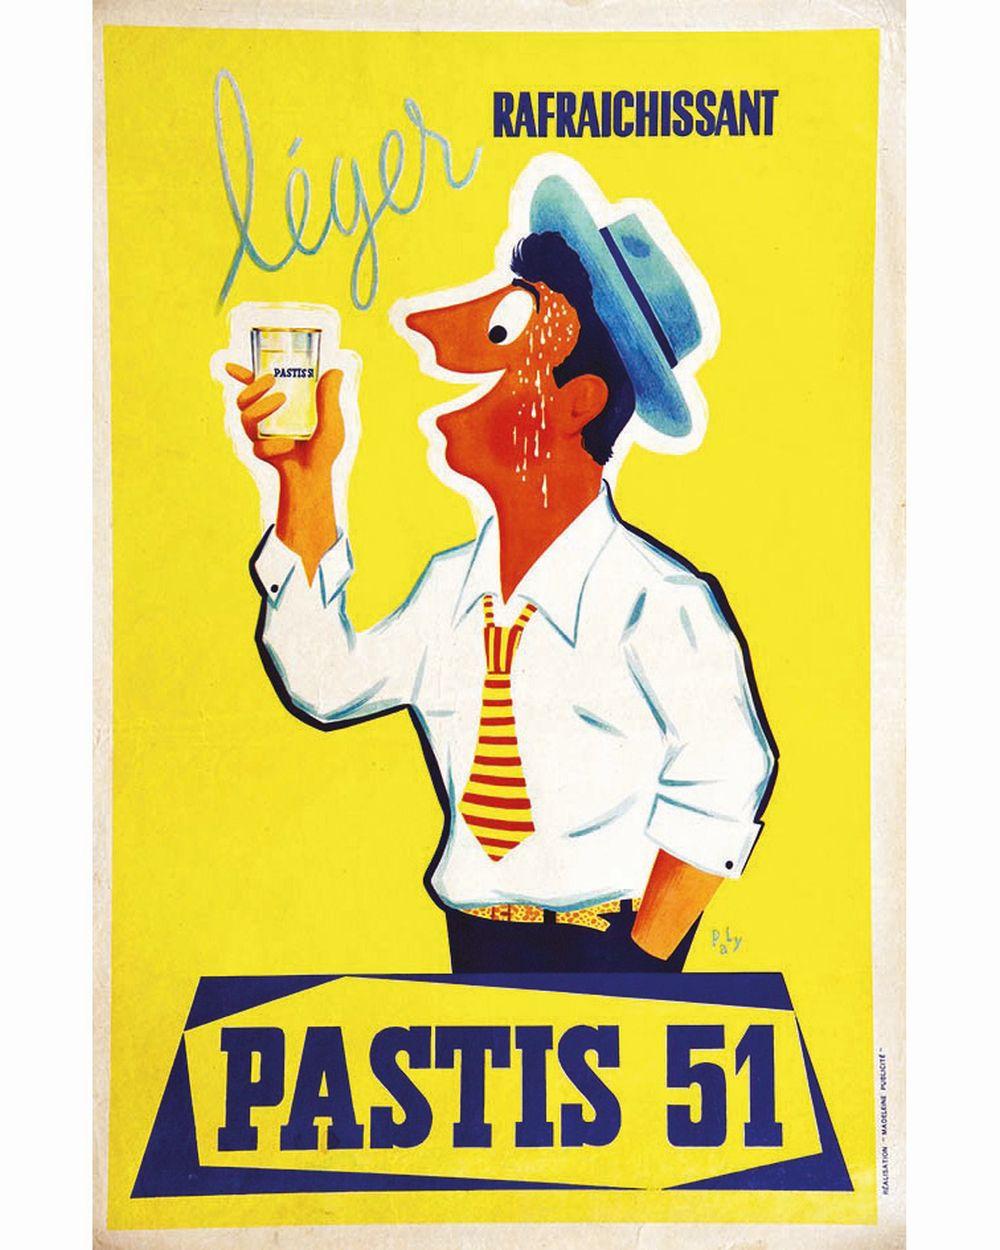 PLAY - Pastis 51 Léger Rafrachissant     vers 1950